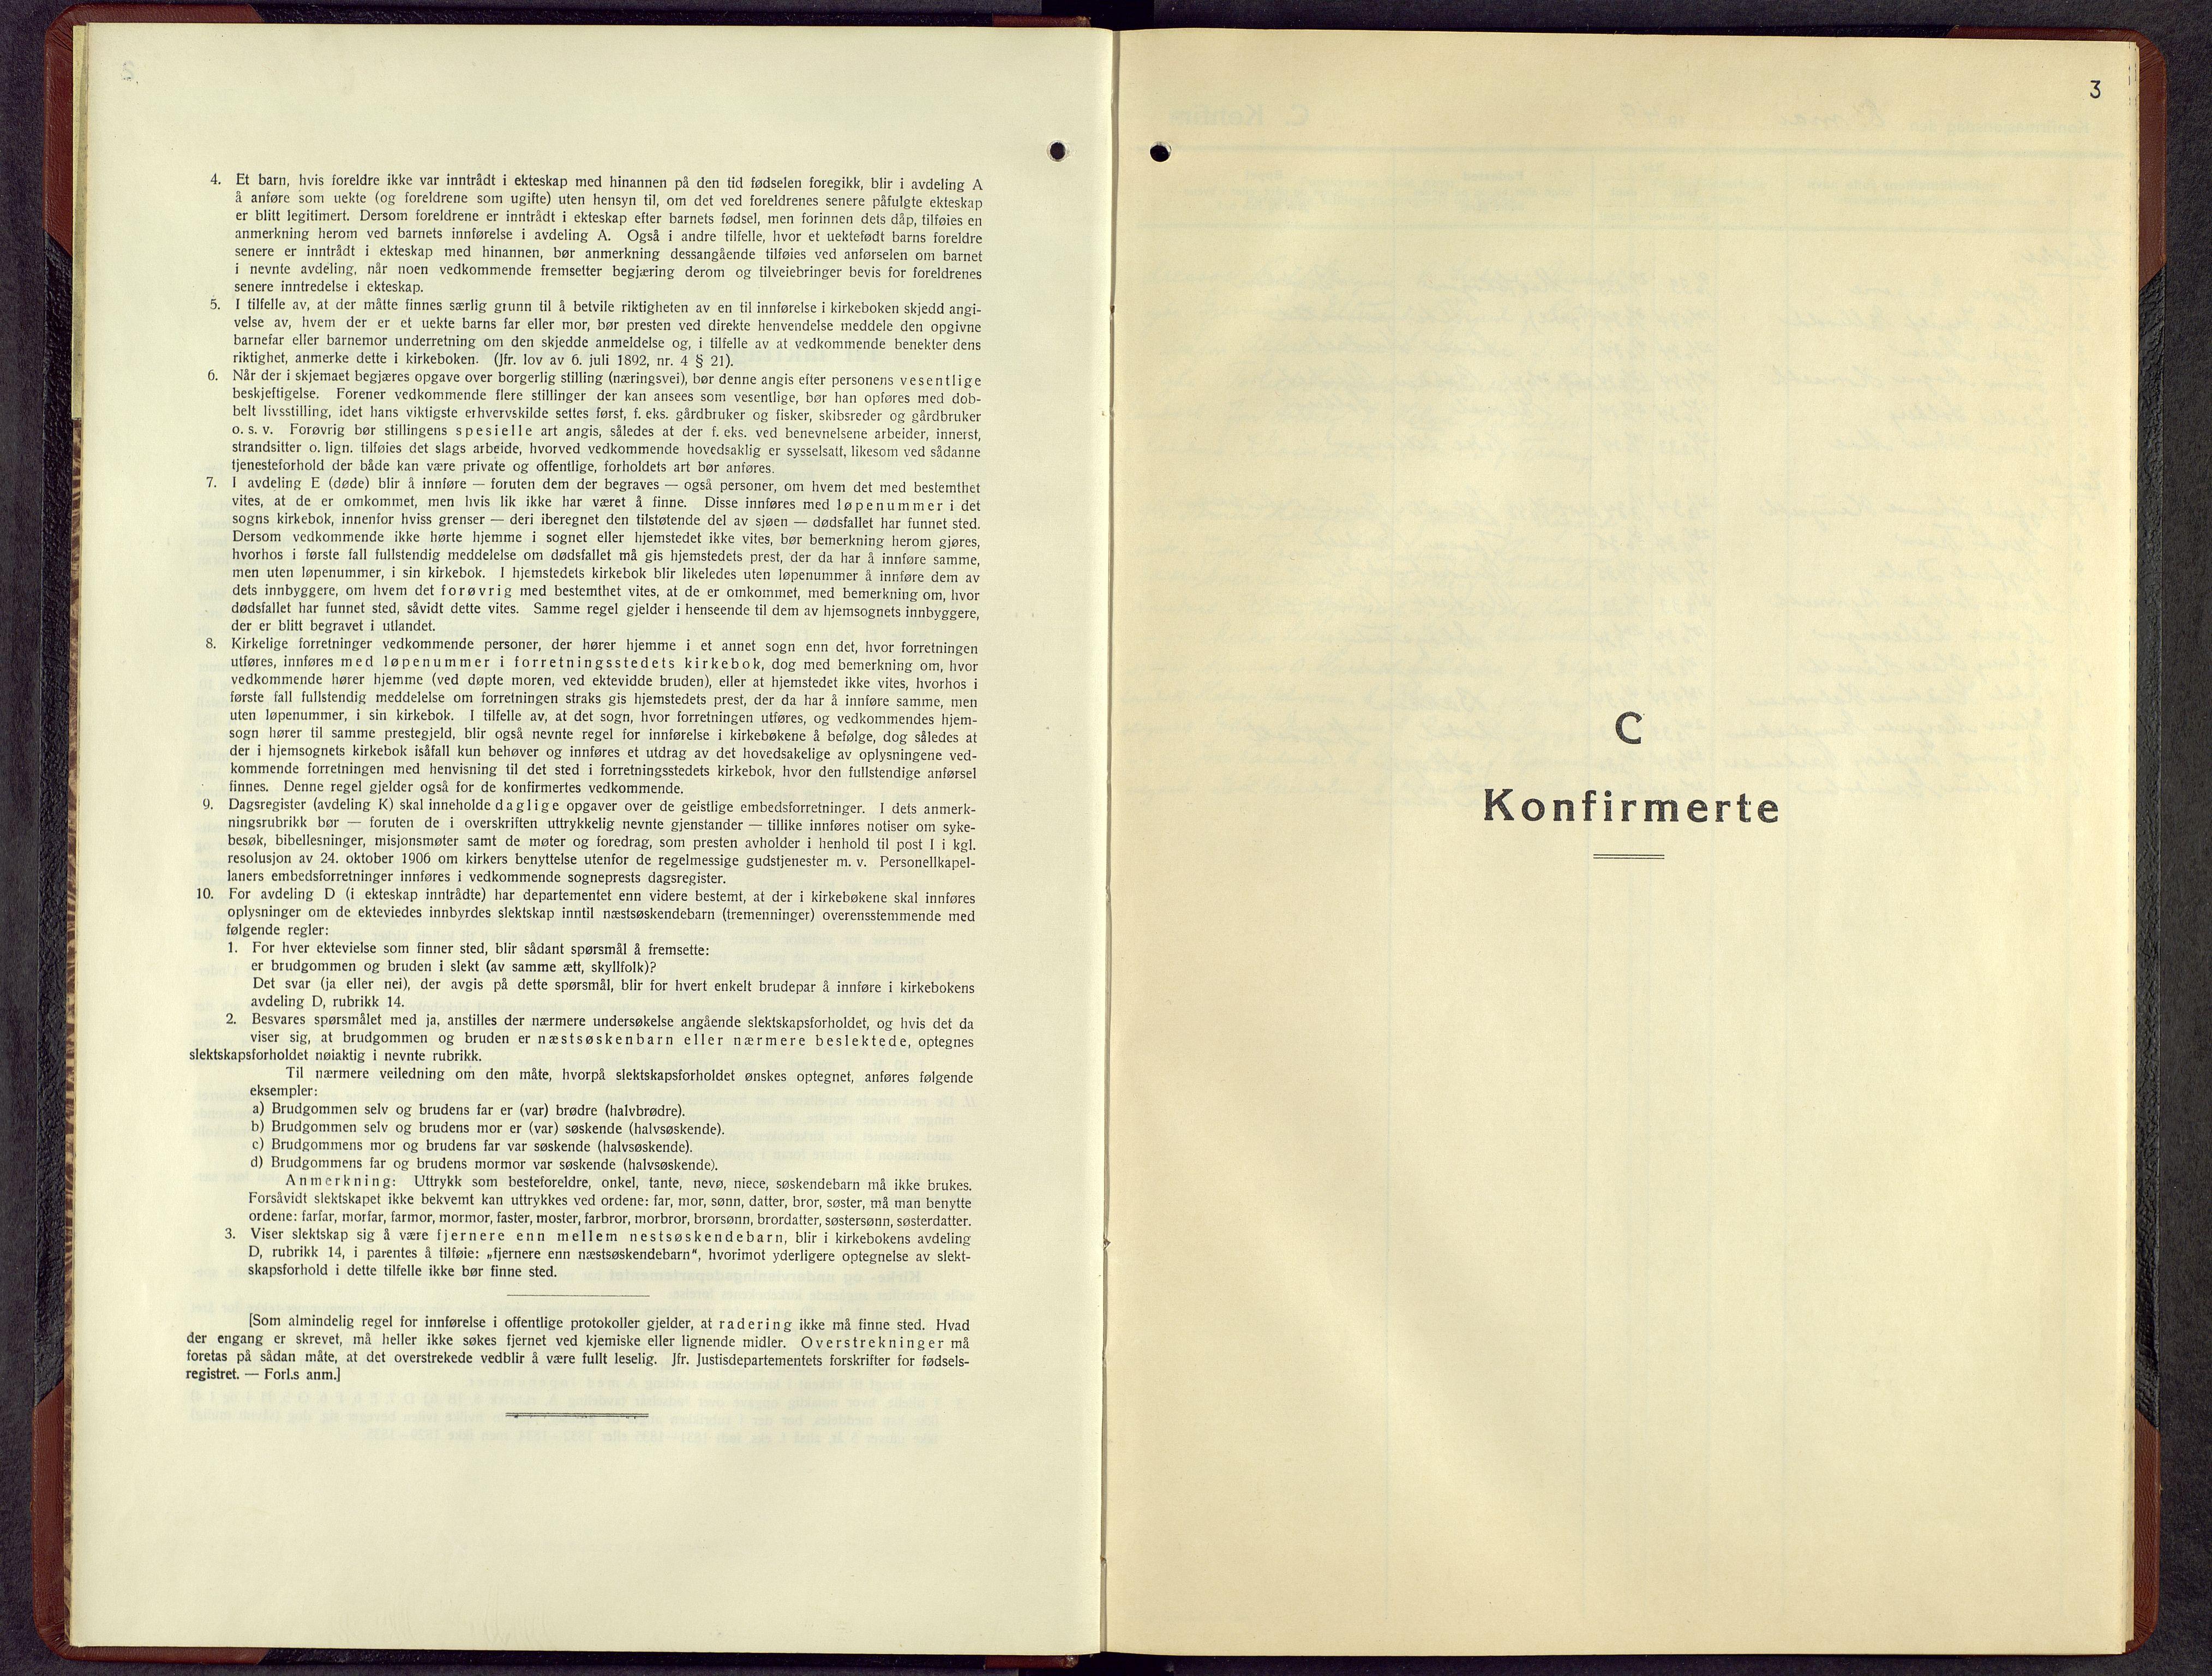 SAH, Rendalen prestekontor, H/Ha/Hab/L0007: Parish register (copy) no. 7, 1949-1958, p. 3